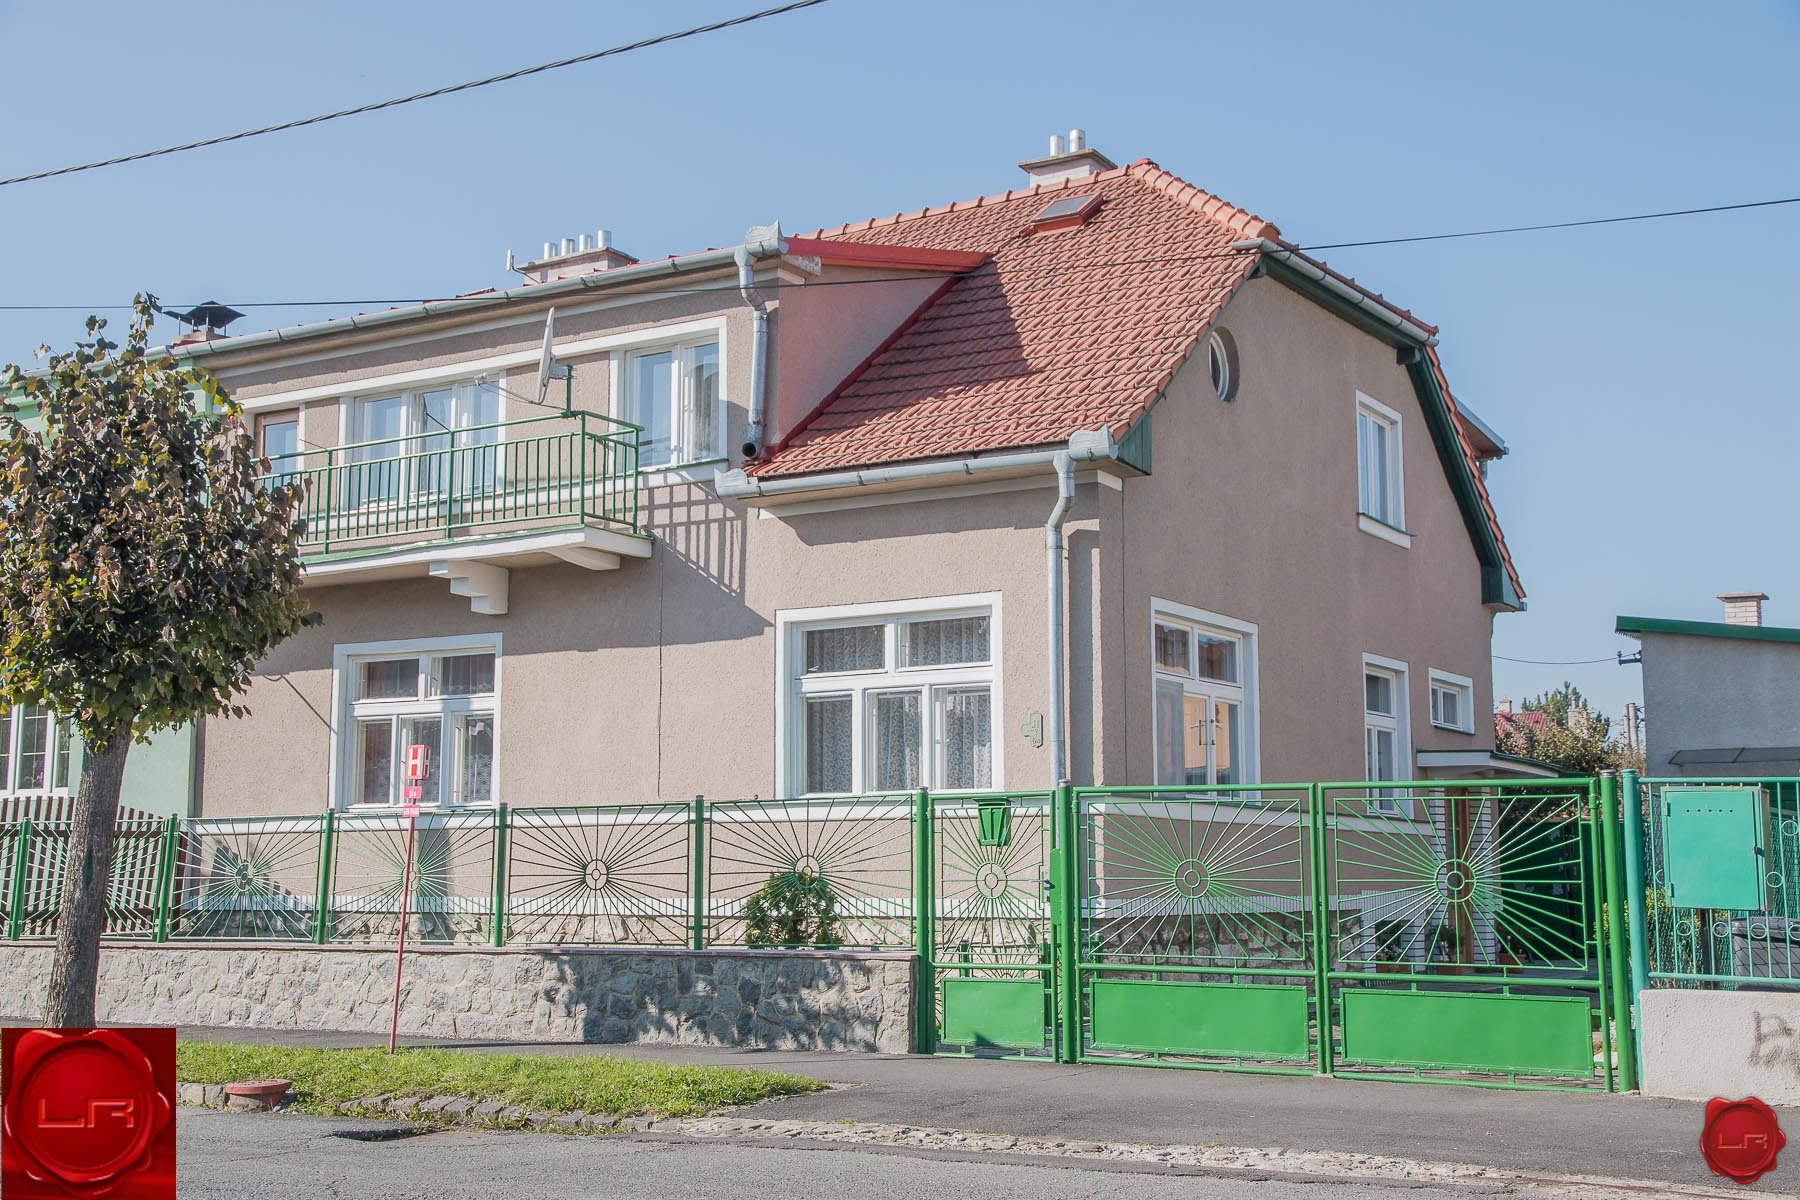 Dvojgeneračný rodinný dom Spišská Nová Ves